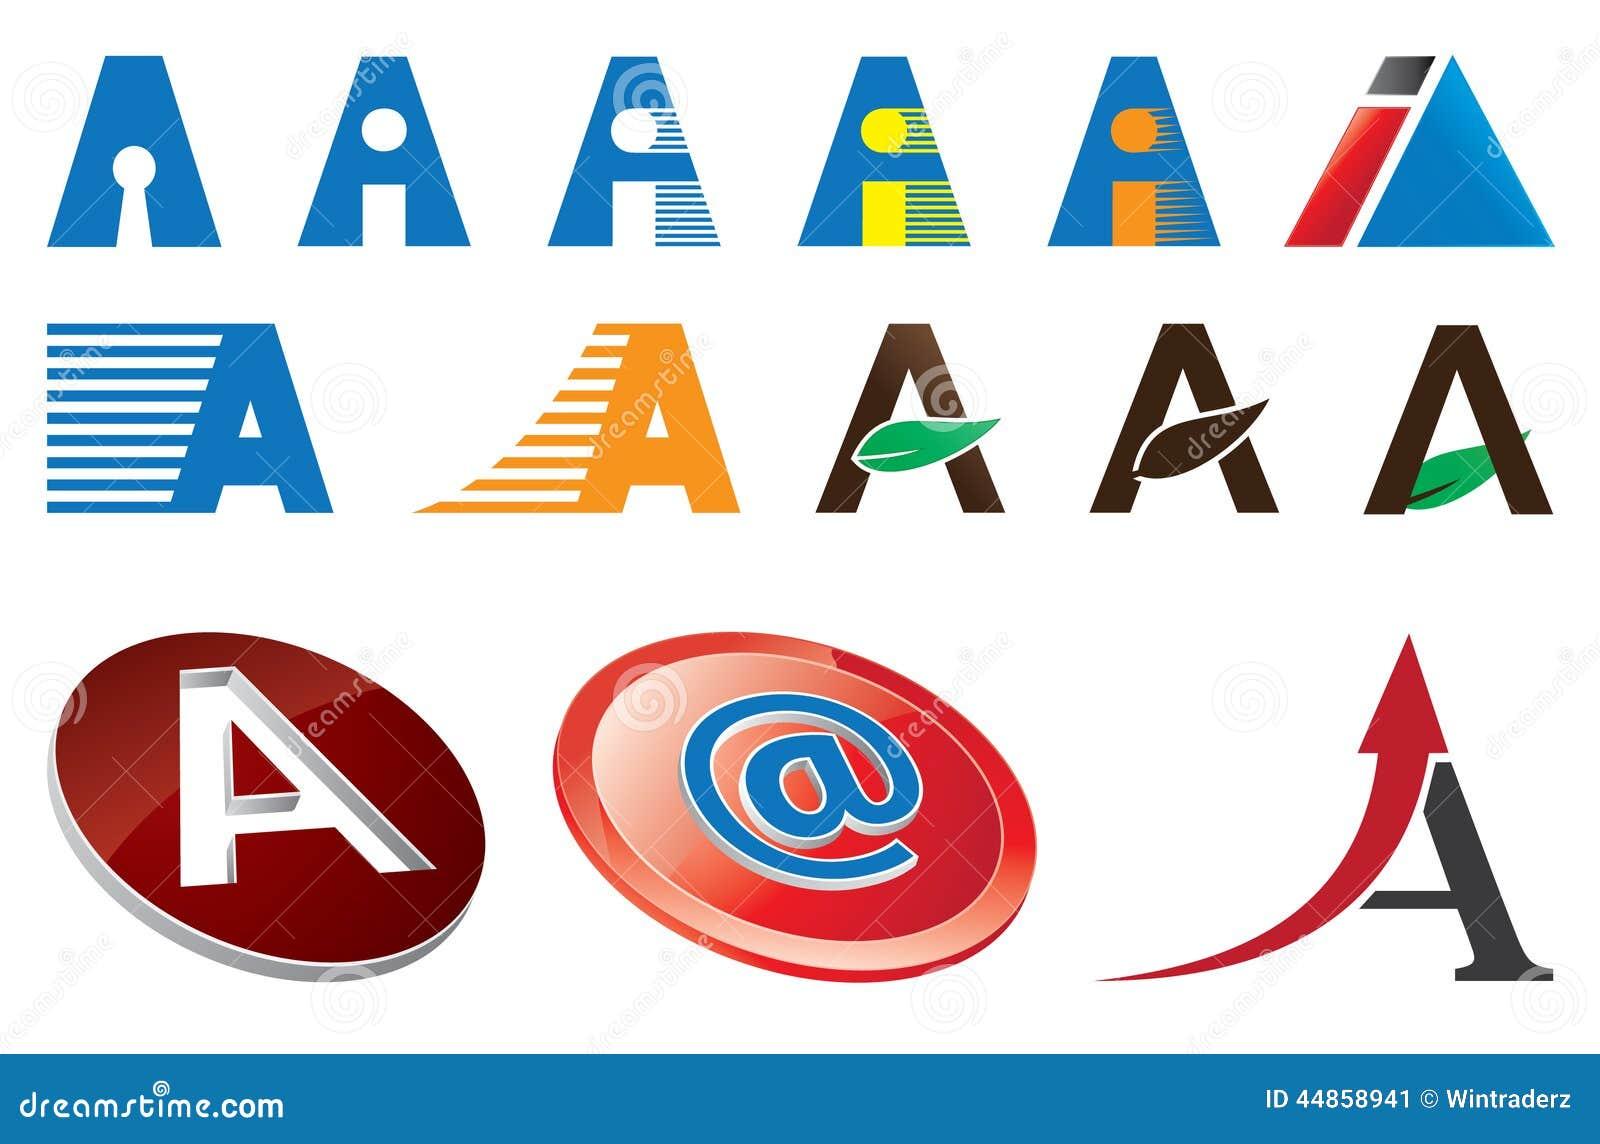 Ponga letras a logo template ilustraci n del vector for Logos con letras